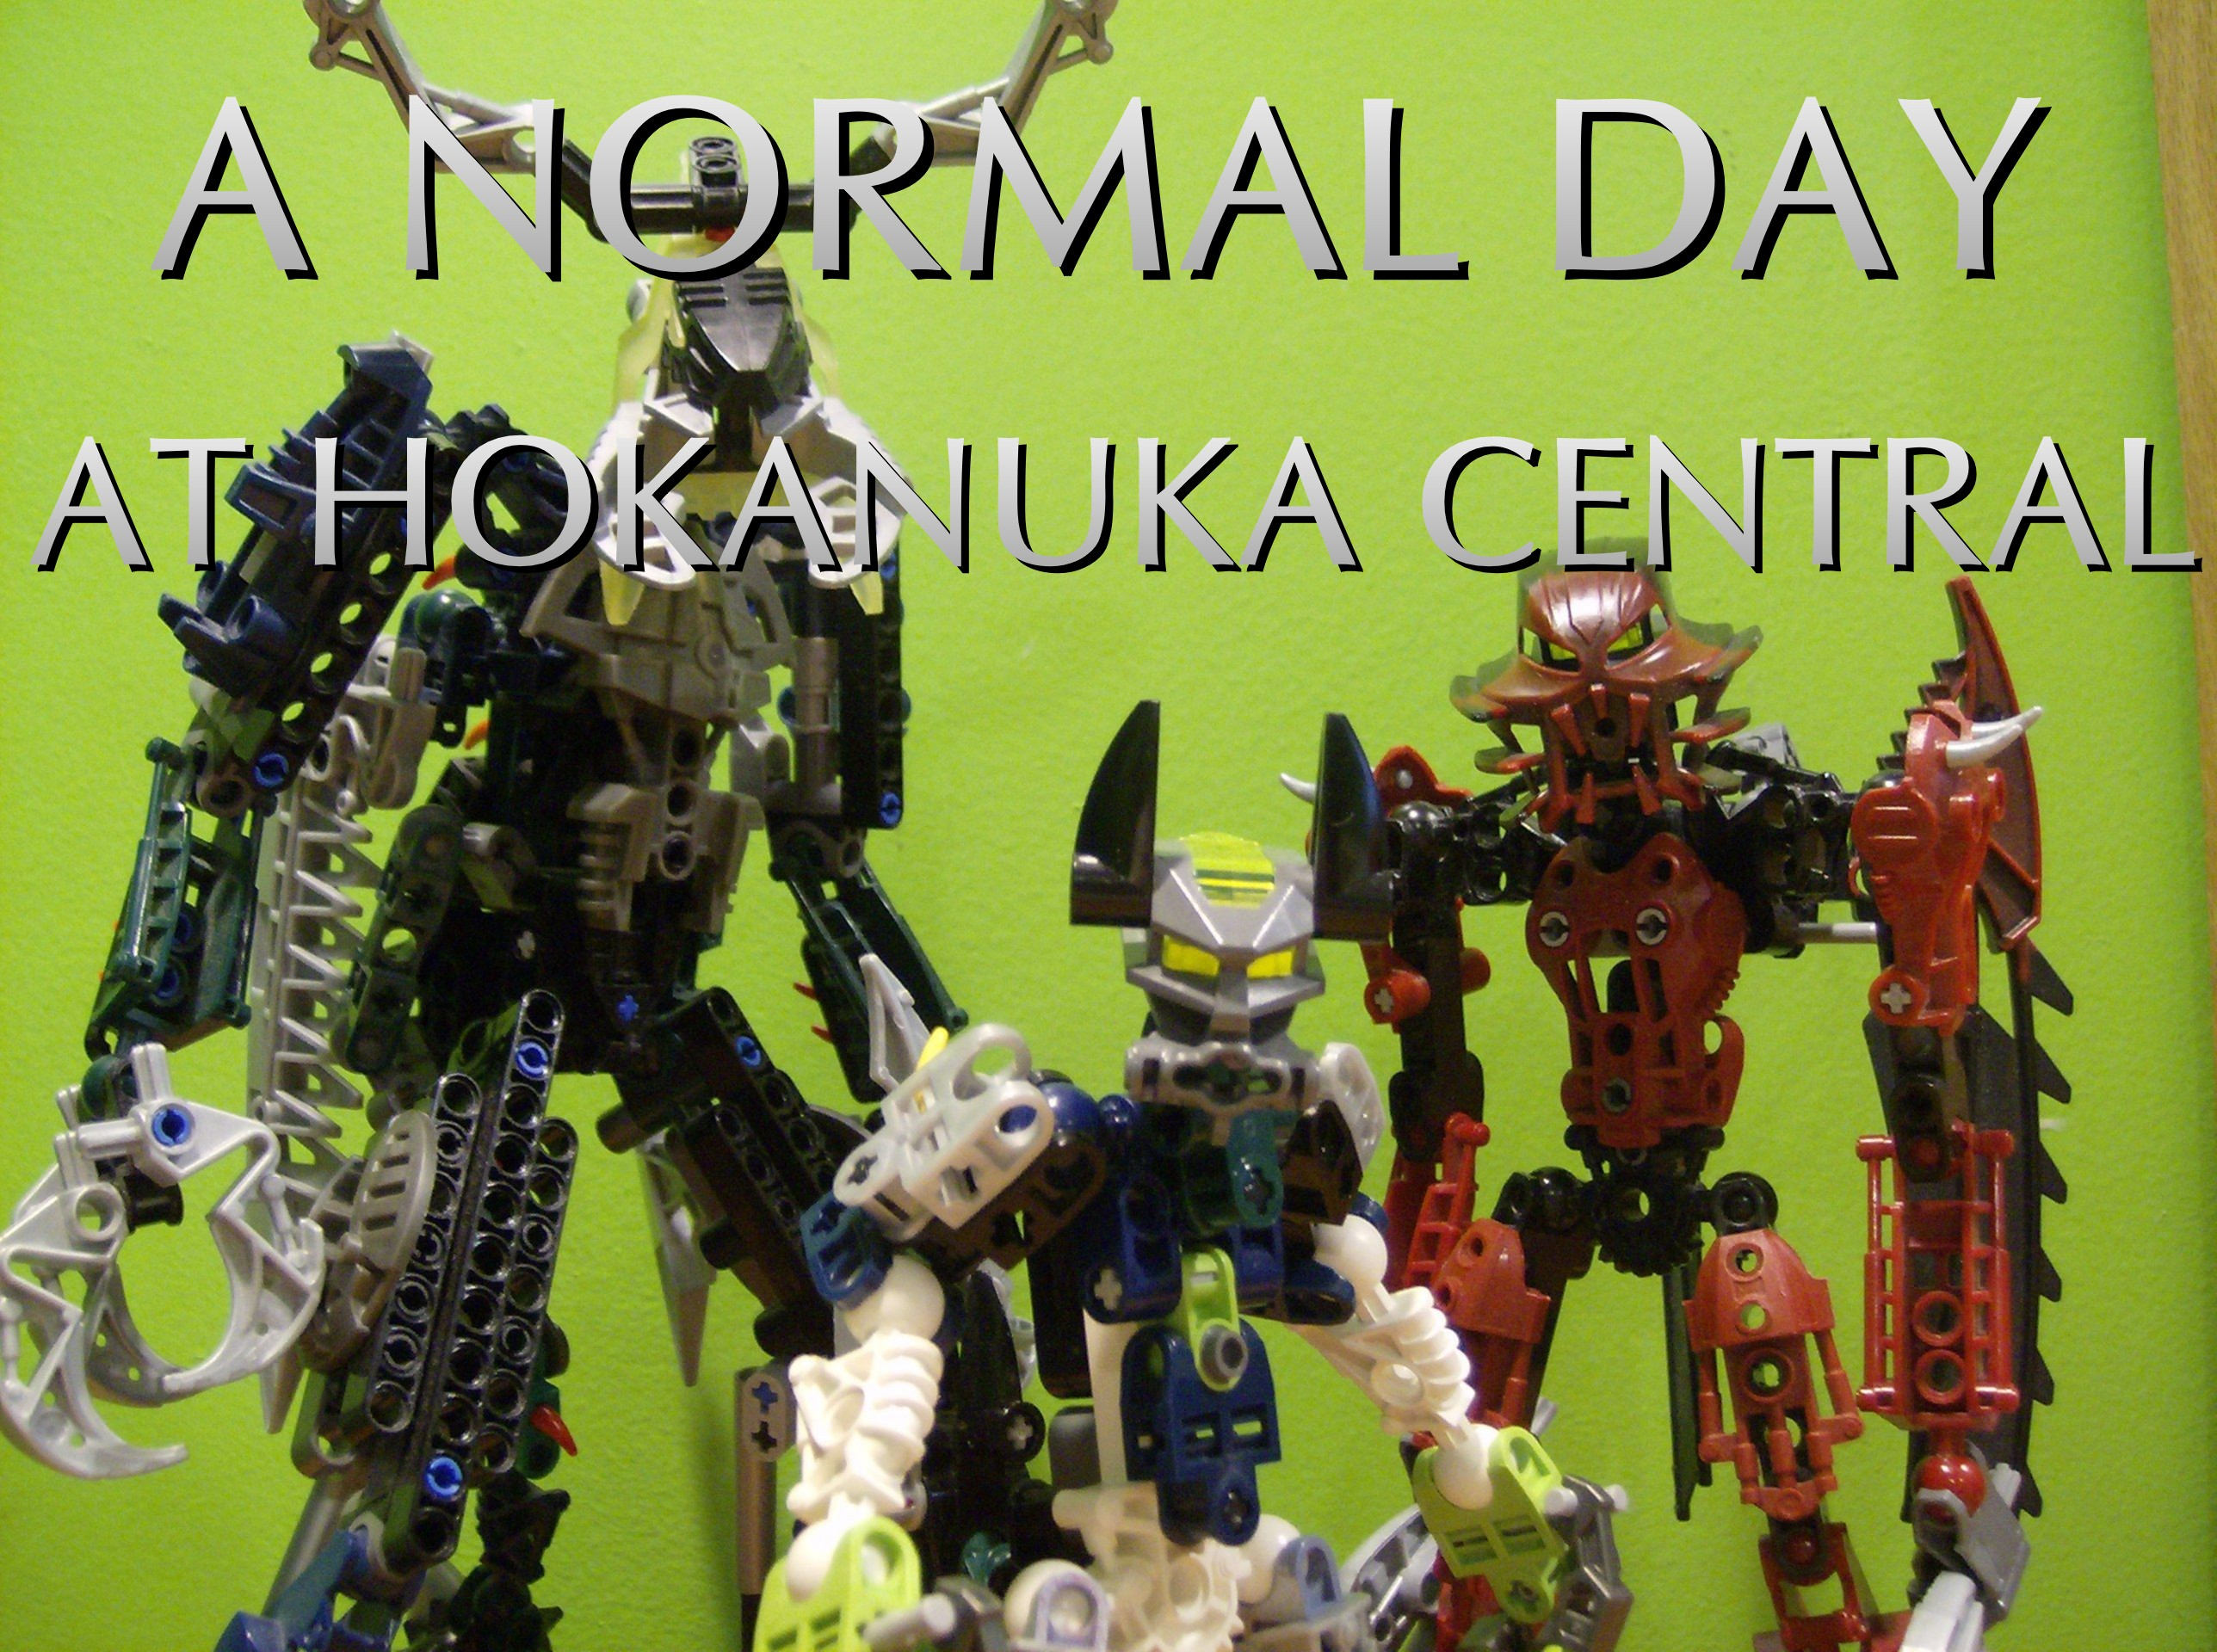 A Normal Day in Hokanuka Central